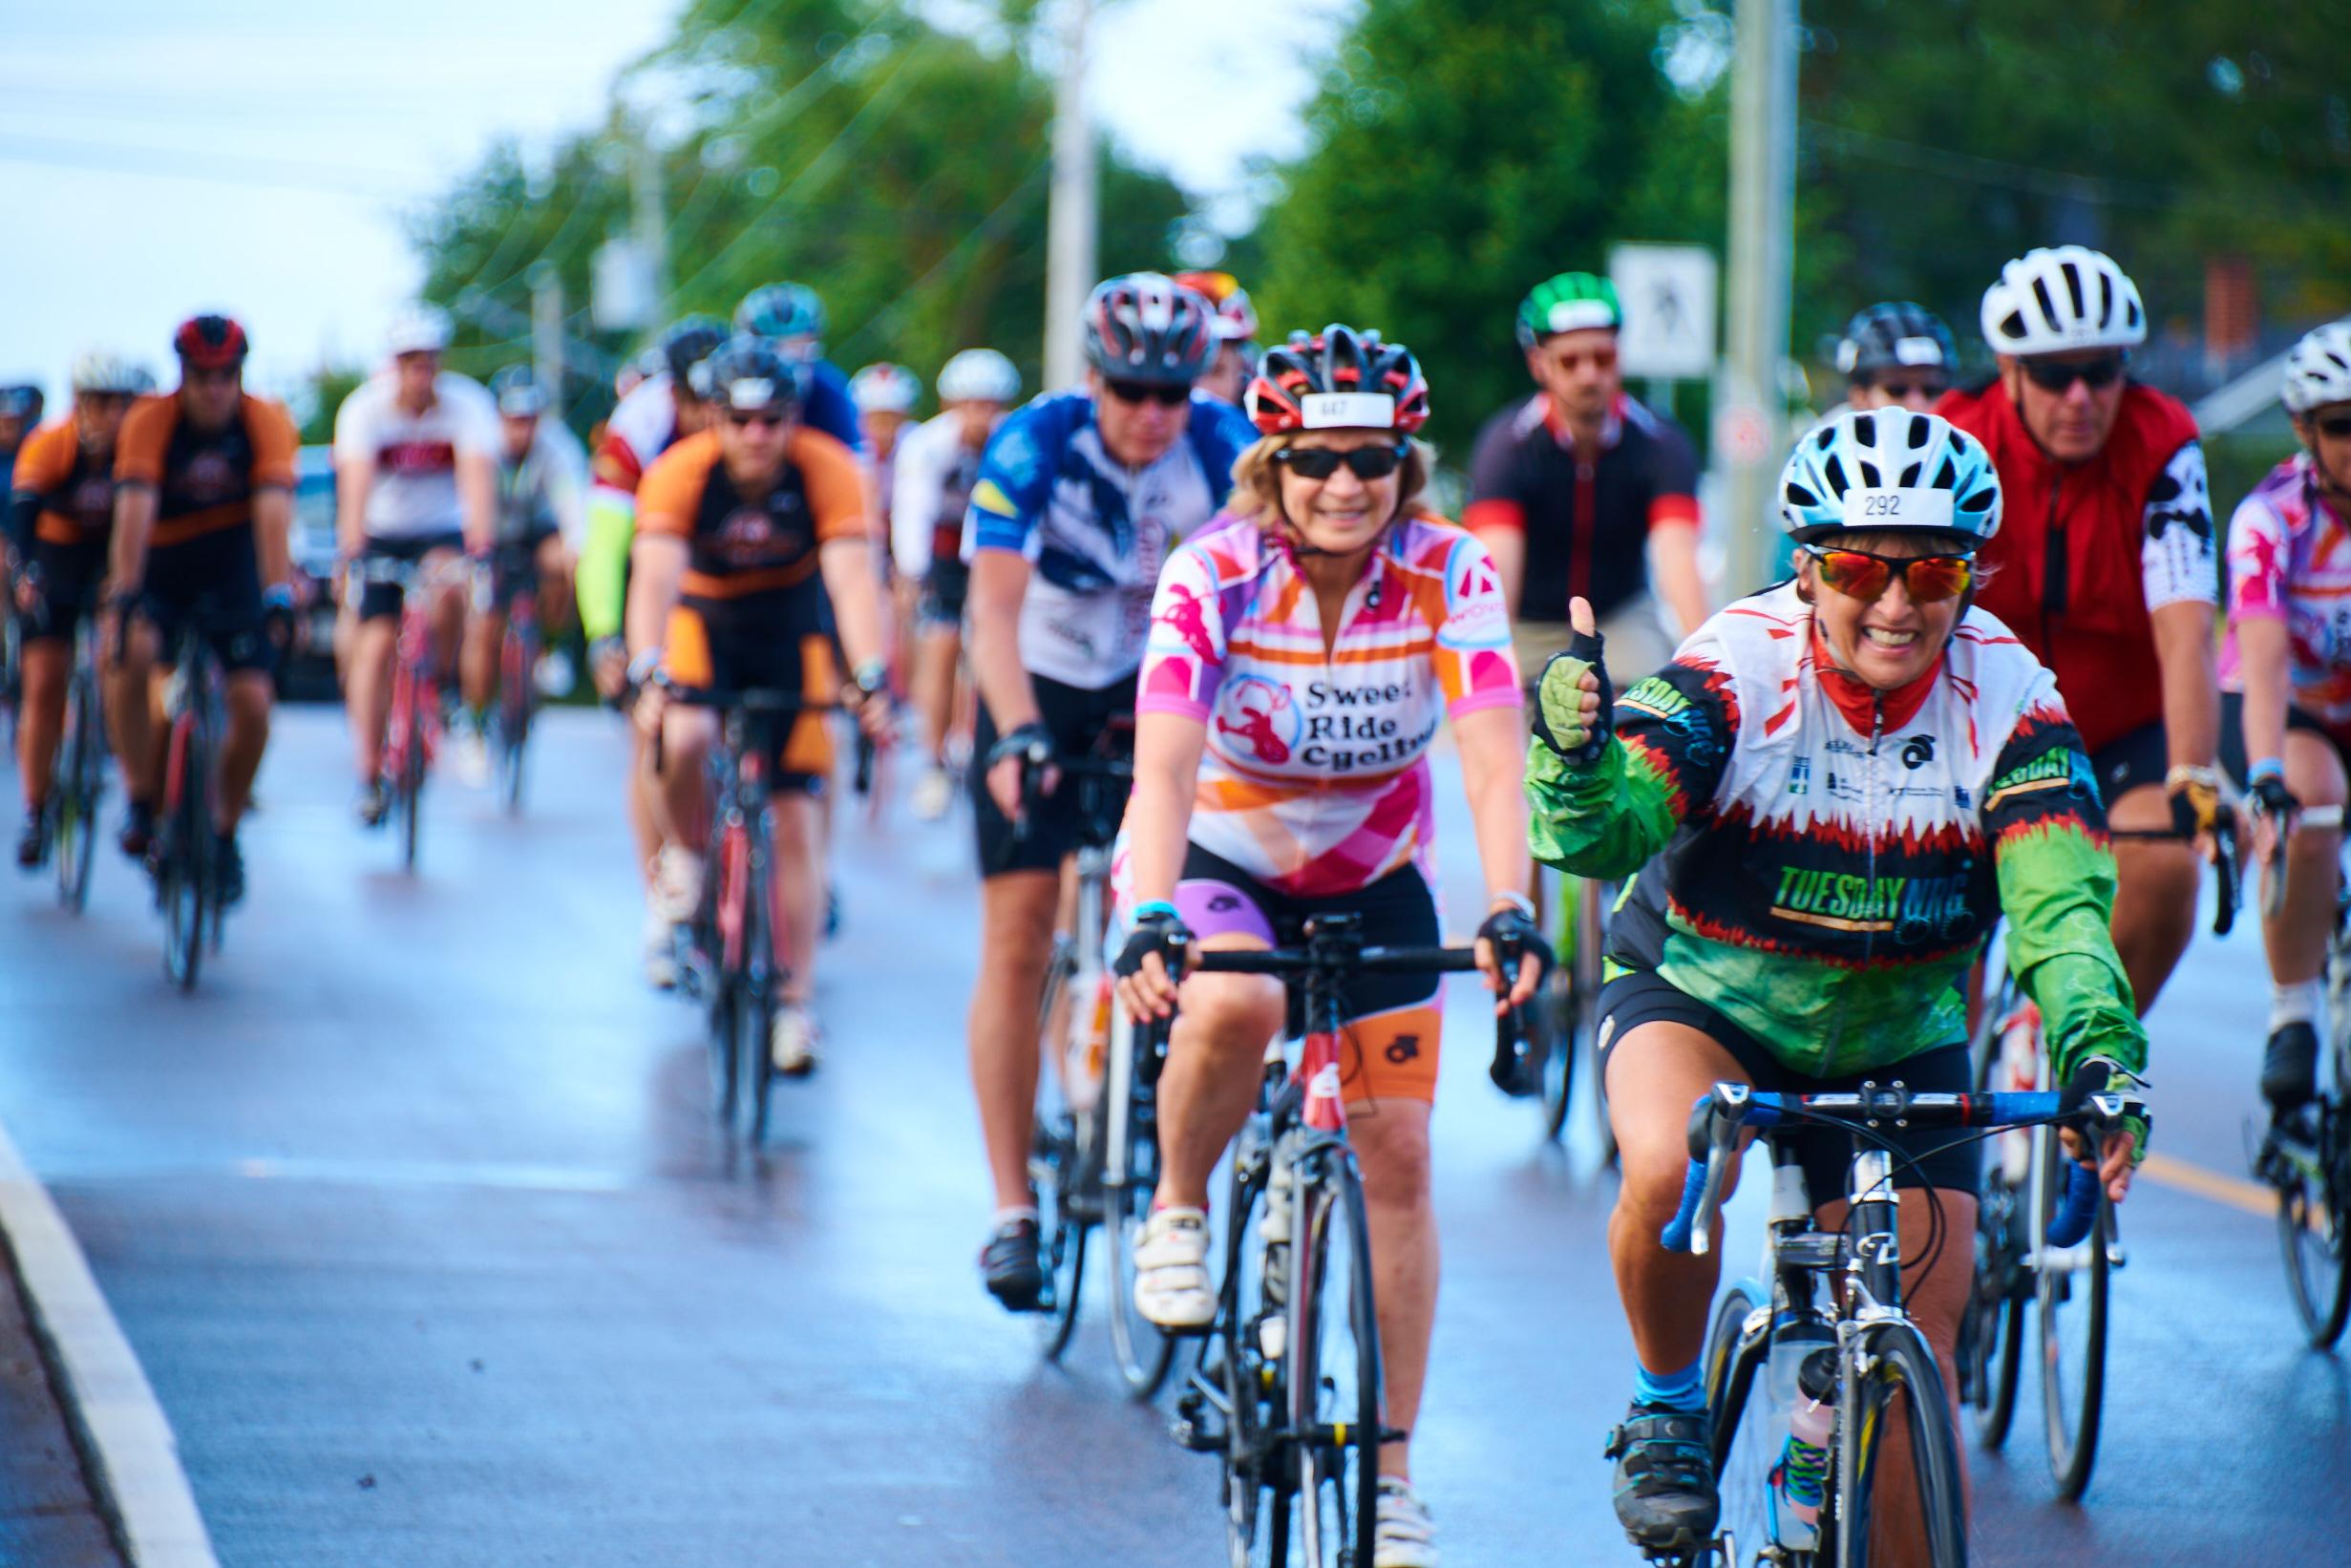 The GranFondo Bicycle Race